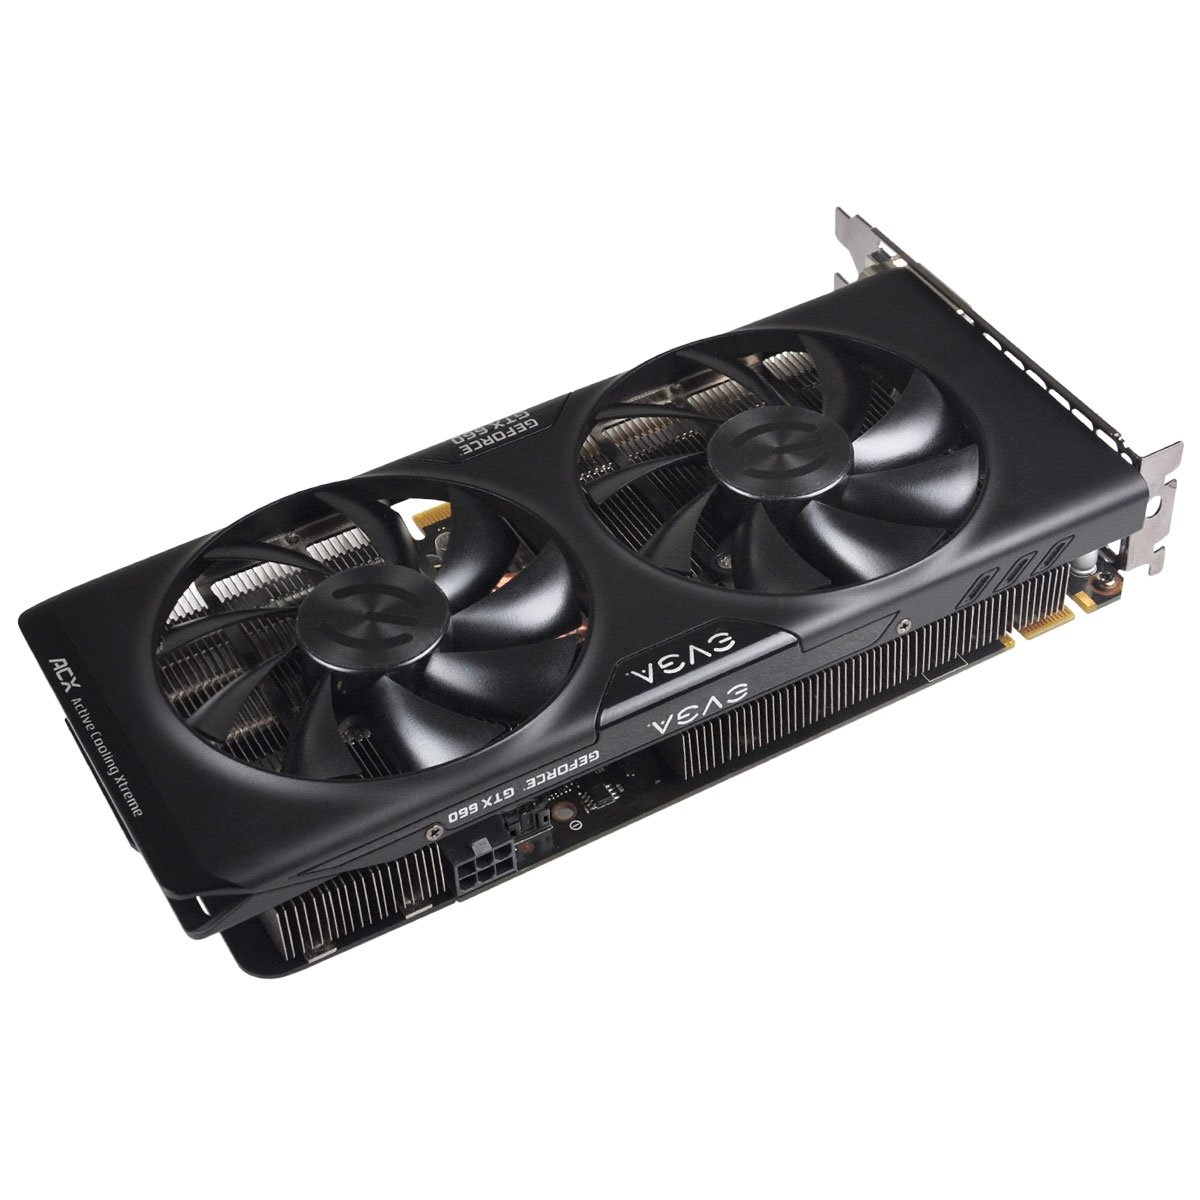 EVGA 02G-P4-3063-KR GeForce GTX 660 2GB GDDR5 - Tarjeta ...